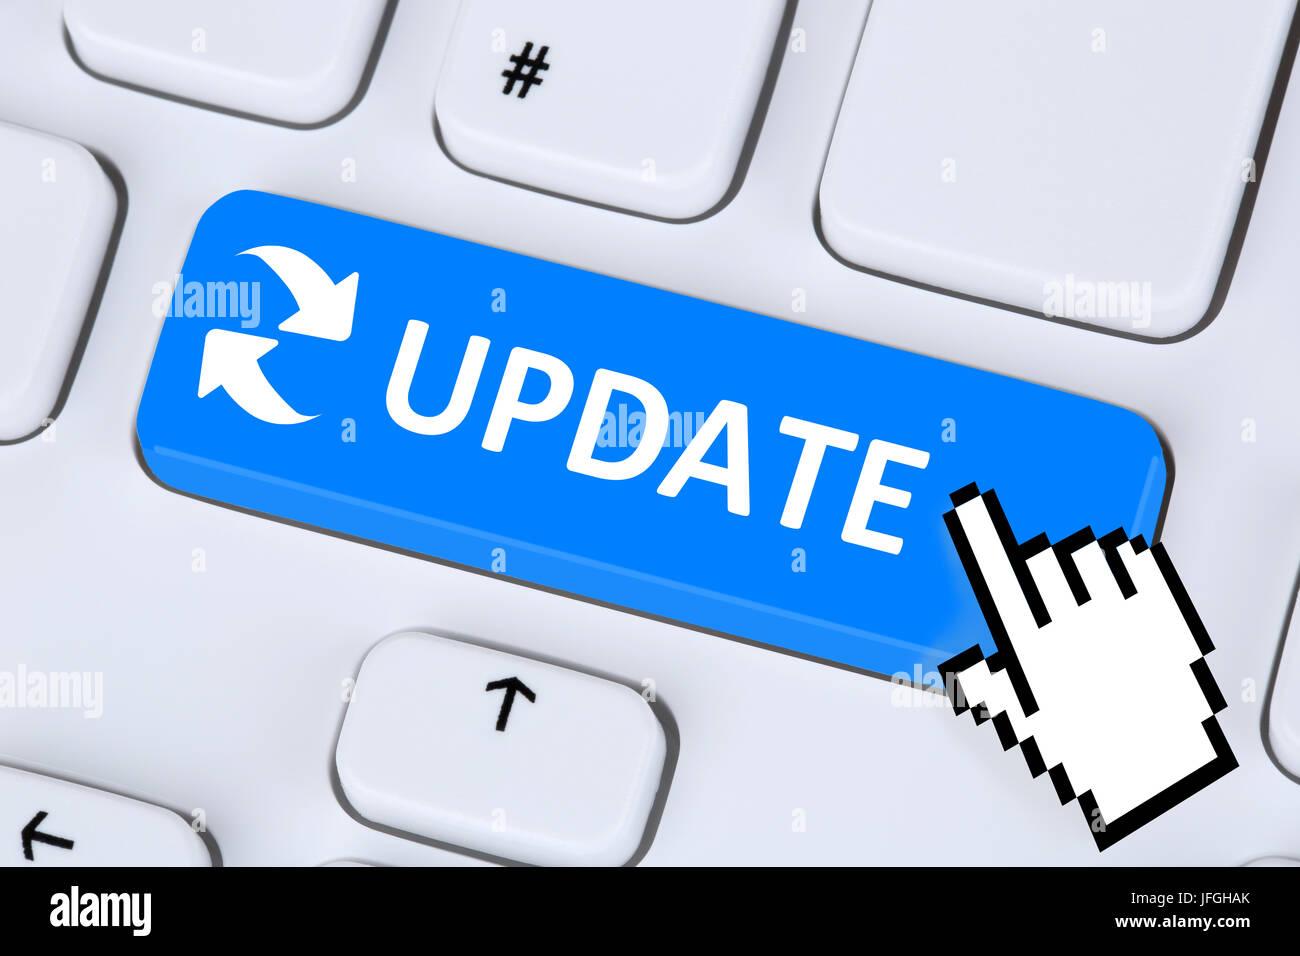 Computer Software Update aktualisieren Schutz vor Virus - Stock Image